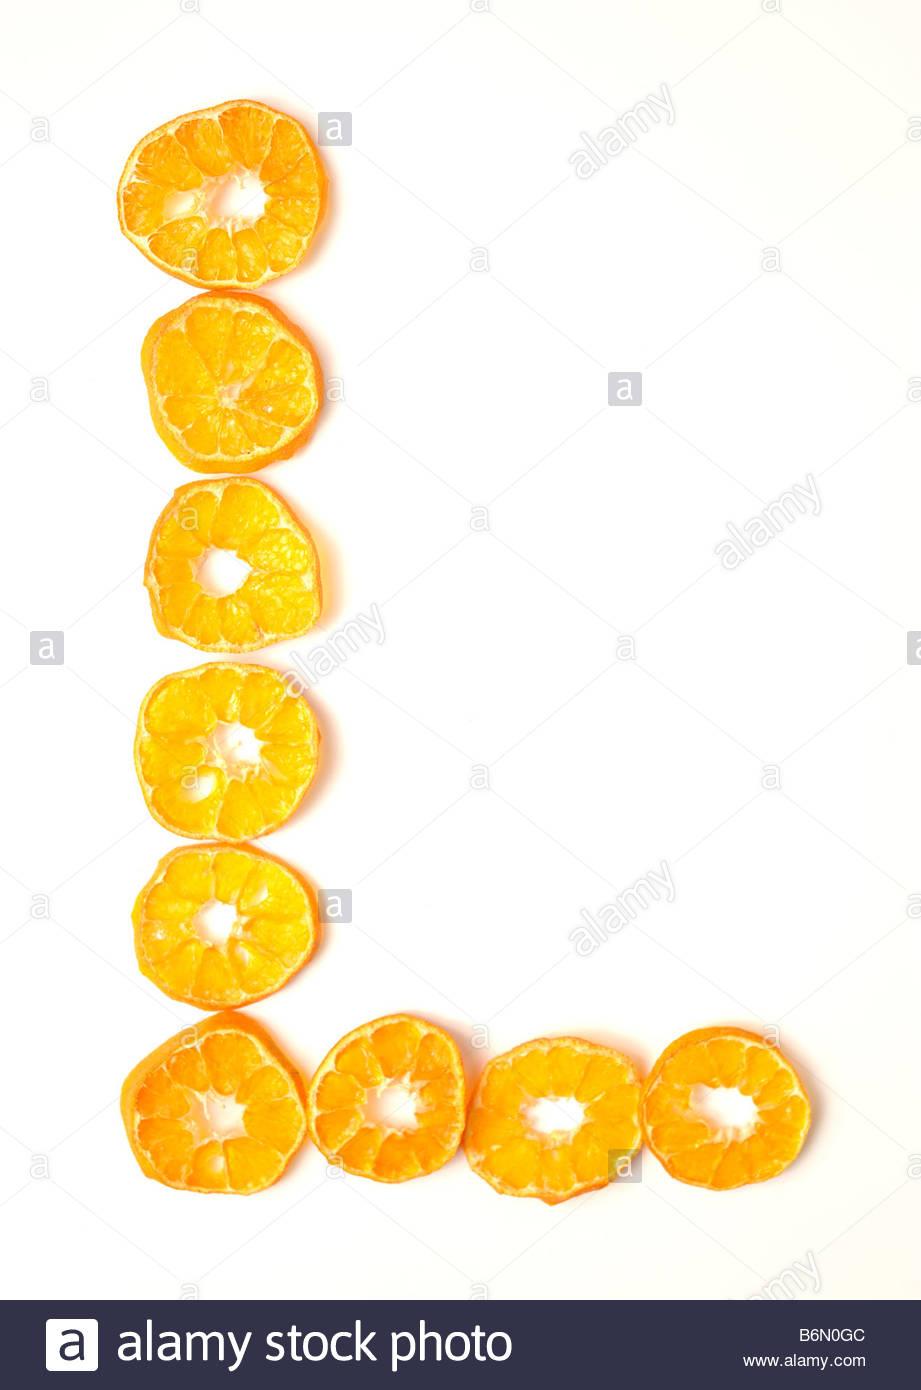 foodfont food font mandarin slices letter l white background cut stock photo foodfont food font mandarin slices letter l white background cut outs search string pbabcm